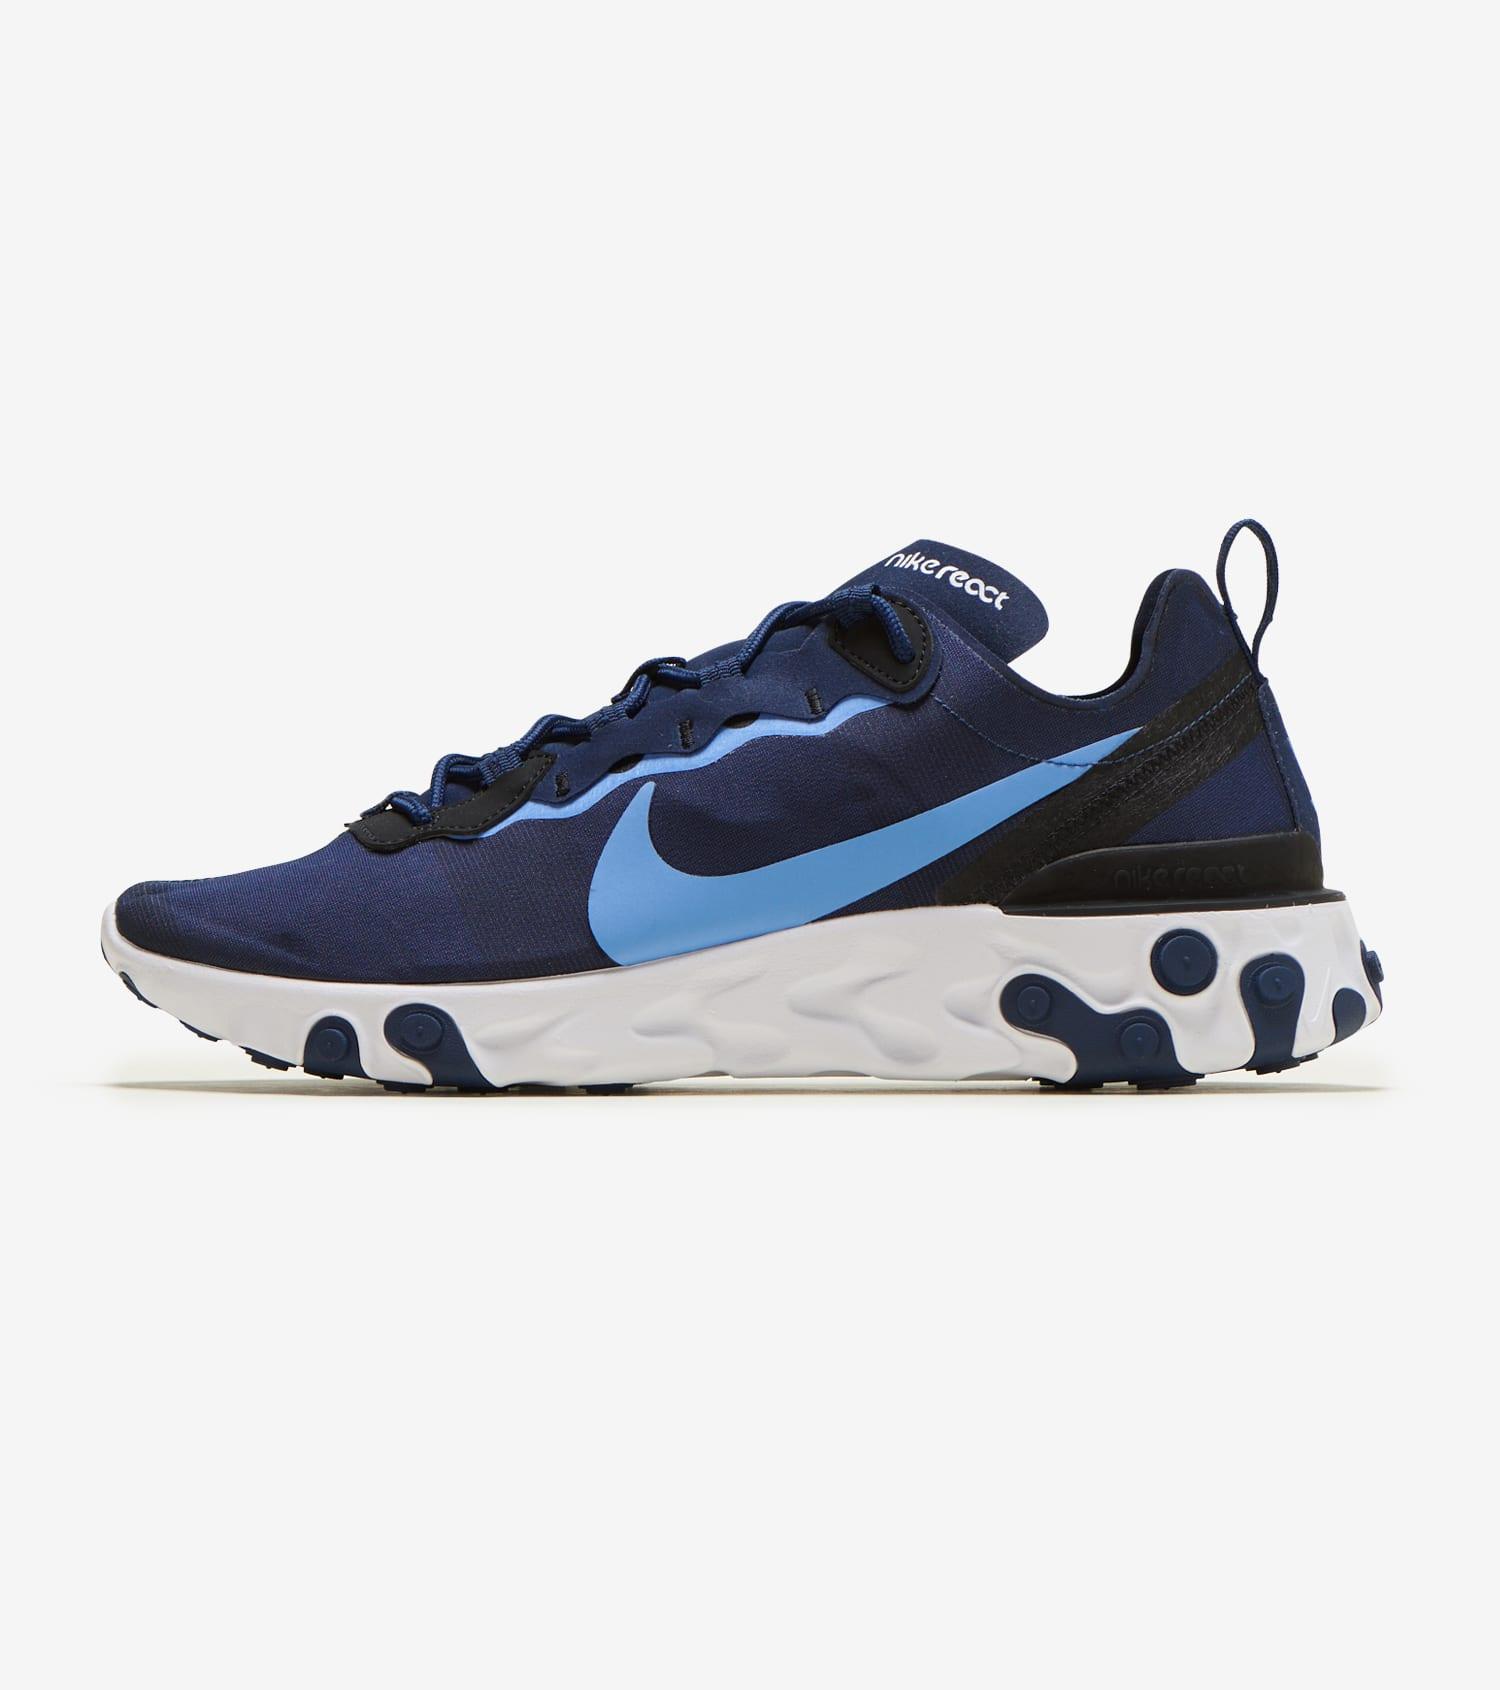 Nike React Element 55 'Olive'   BQ6166 200